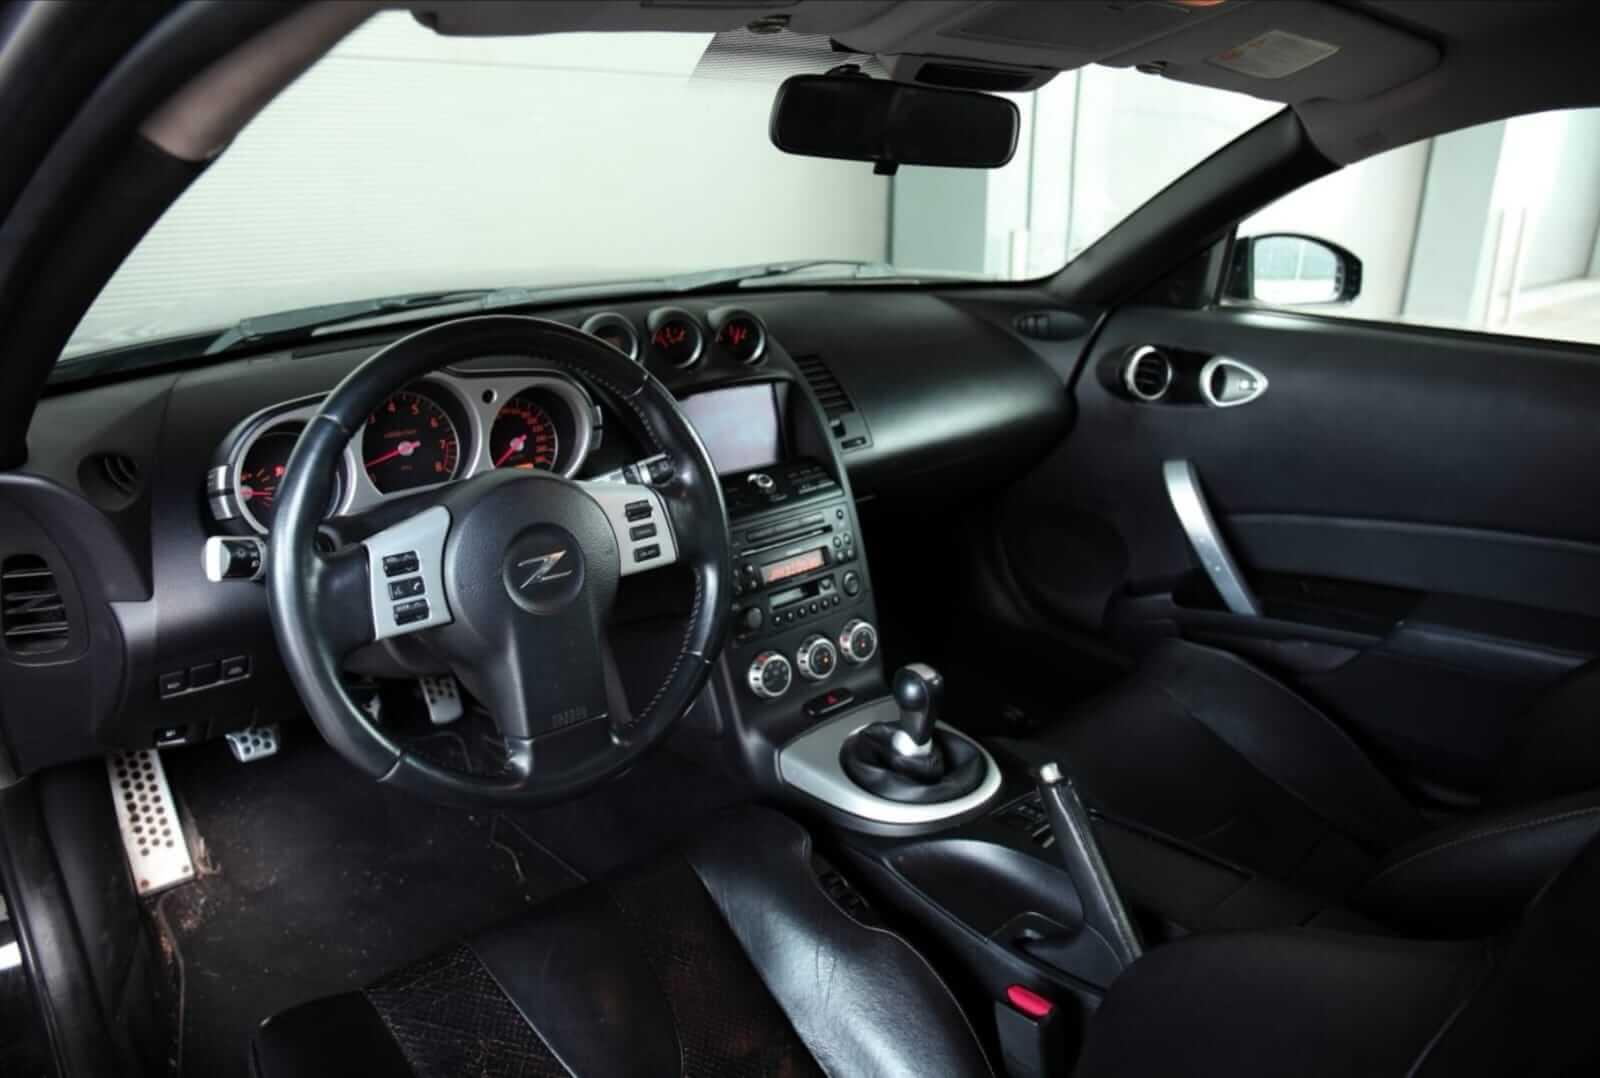 Nissan 350Z HR Track Edition 2008 interior – by Next Level Automotive – Go to nextlevelautomotive.eu